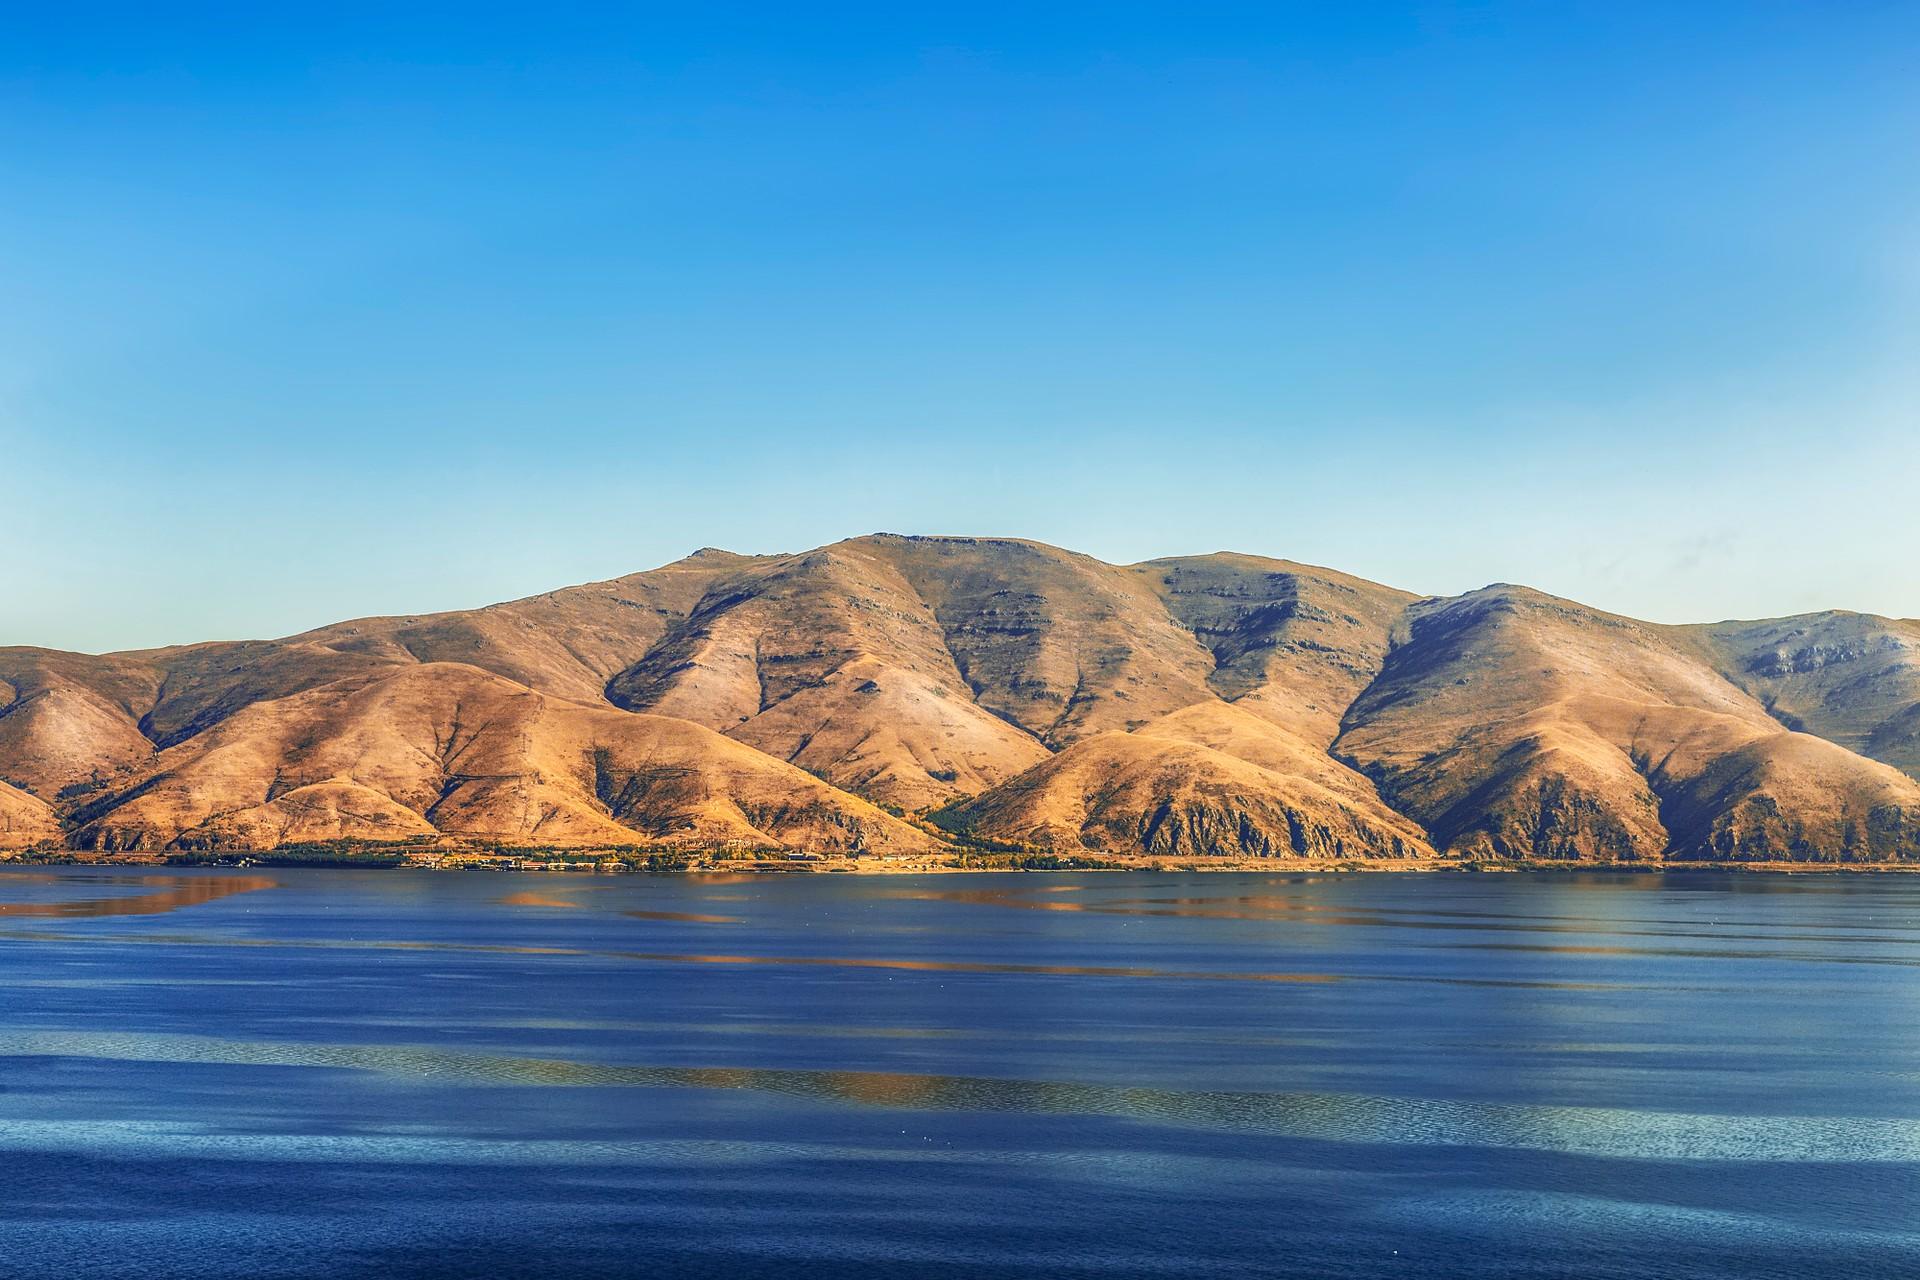 The beautiful lakes and mountains of Armenia